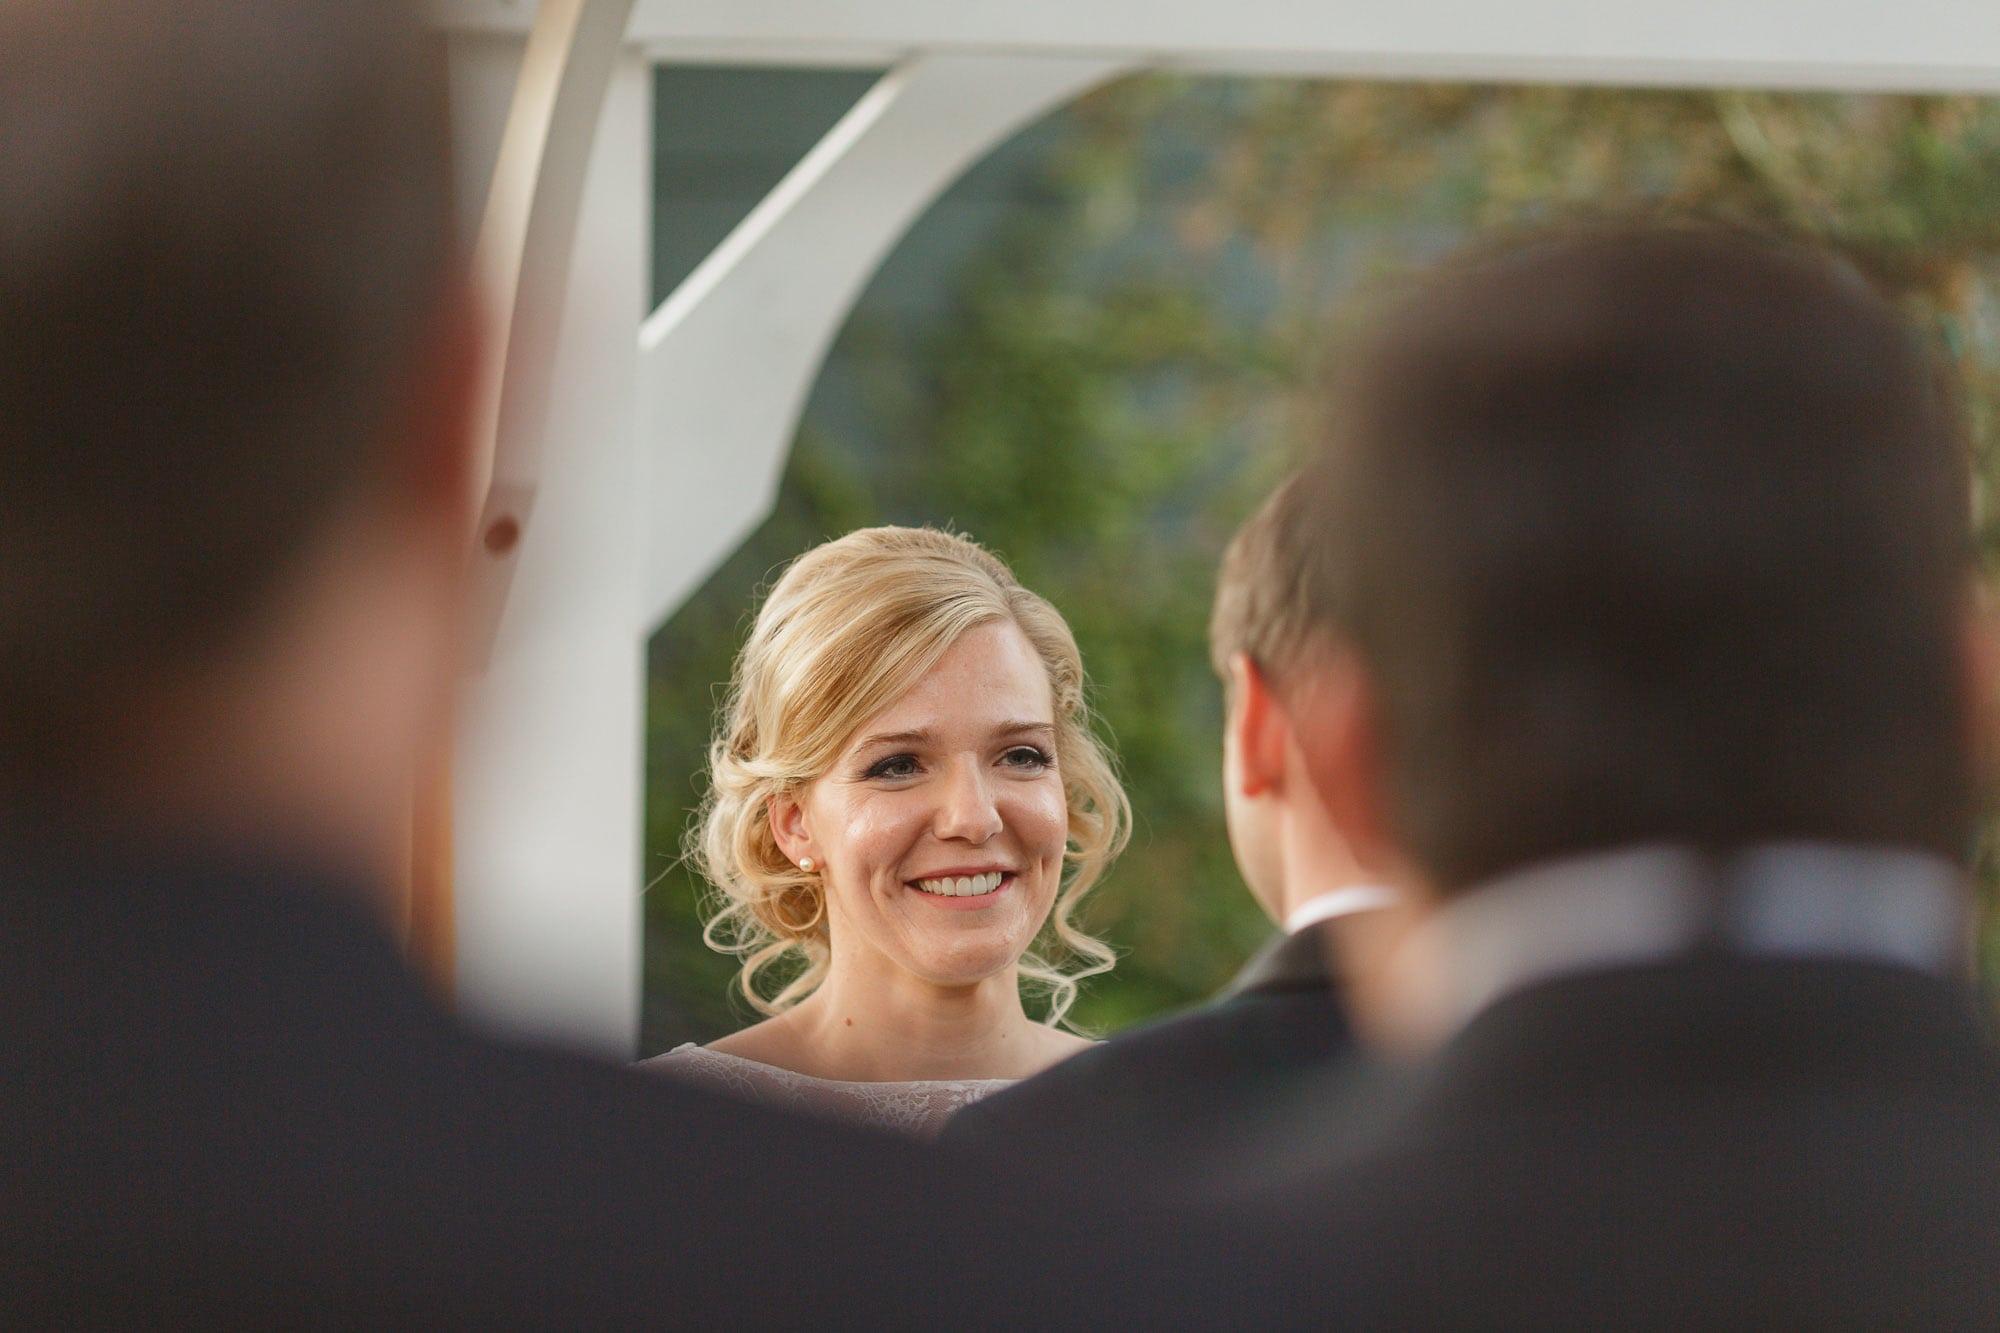 046_Alan_and_Heidi_Los_Angeles_Equestrian_Center_Wedding